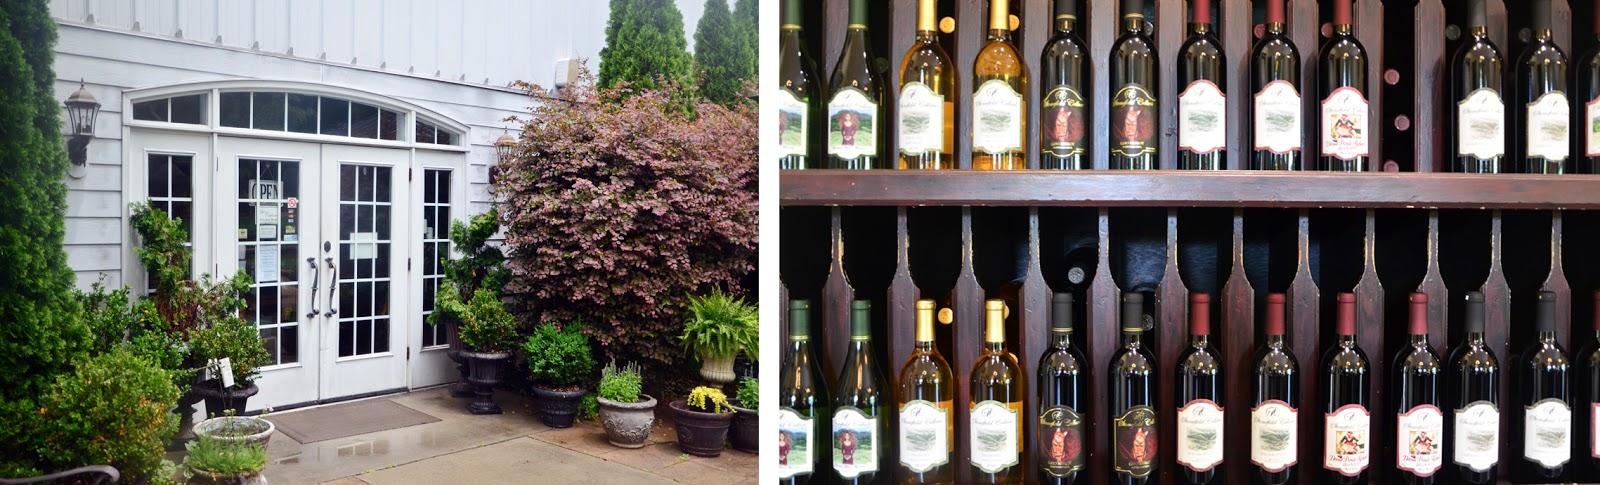 Stonefield Cellars NC Wine-2.jpg